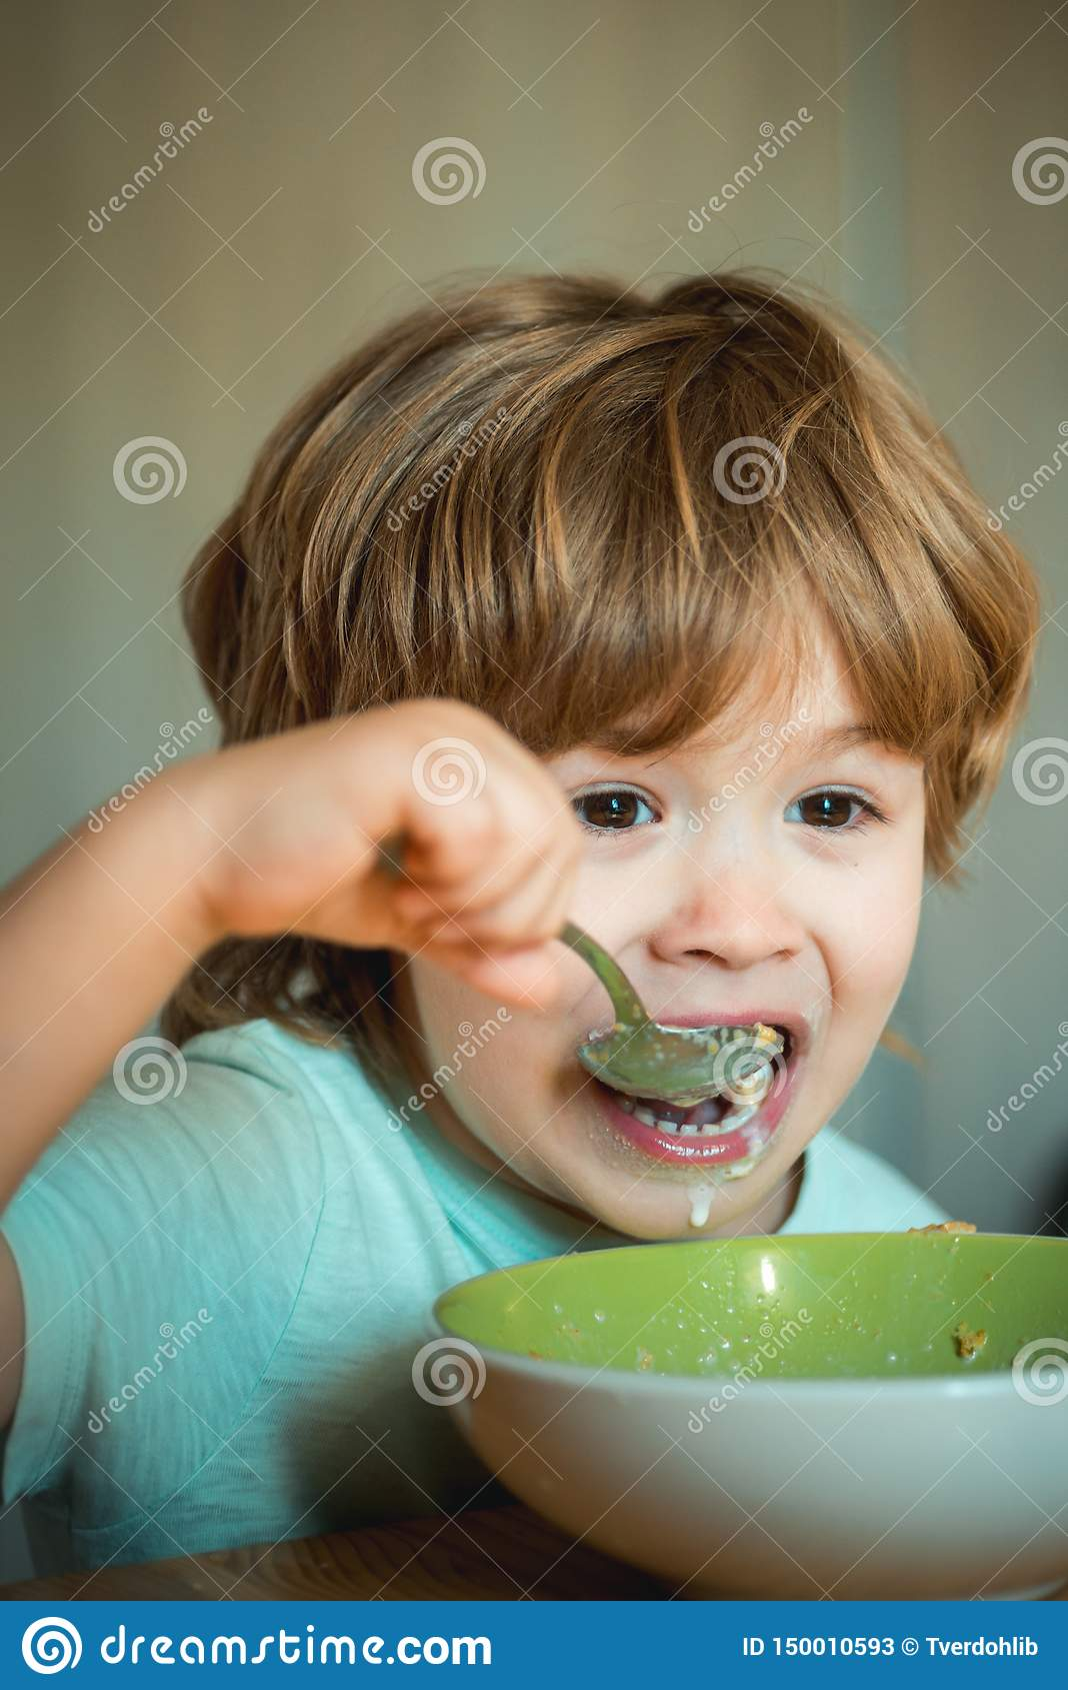 Childcare Μικρό παιδί που έχει το πρόγευμα στην κουζίνα Τρόφιμα και ποτό για το παιδί Μικρό παιδί - έννοια τροφίμων οικολογίας r